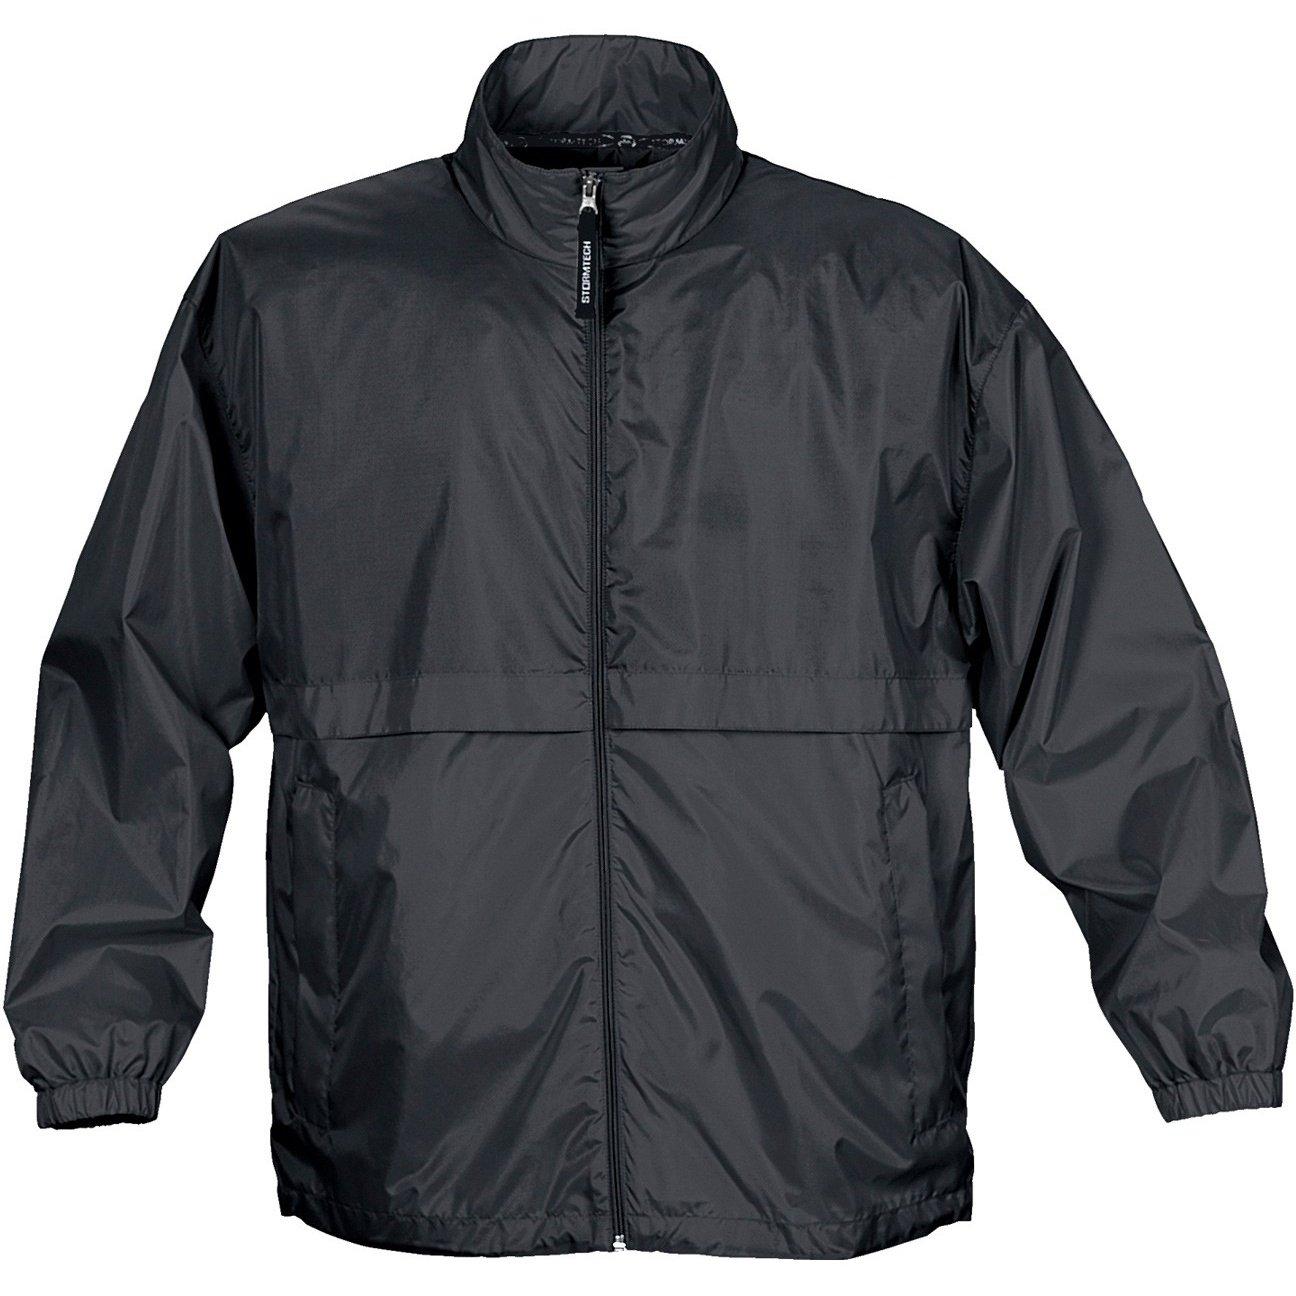 e3c86d102c5 Stormtech Mens Squall Packable Water Resistant Jacket at Amazon Men s  Clothing store  Raincoats